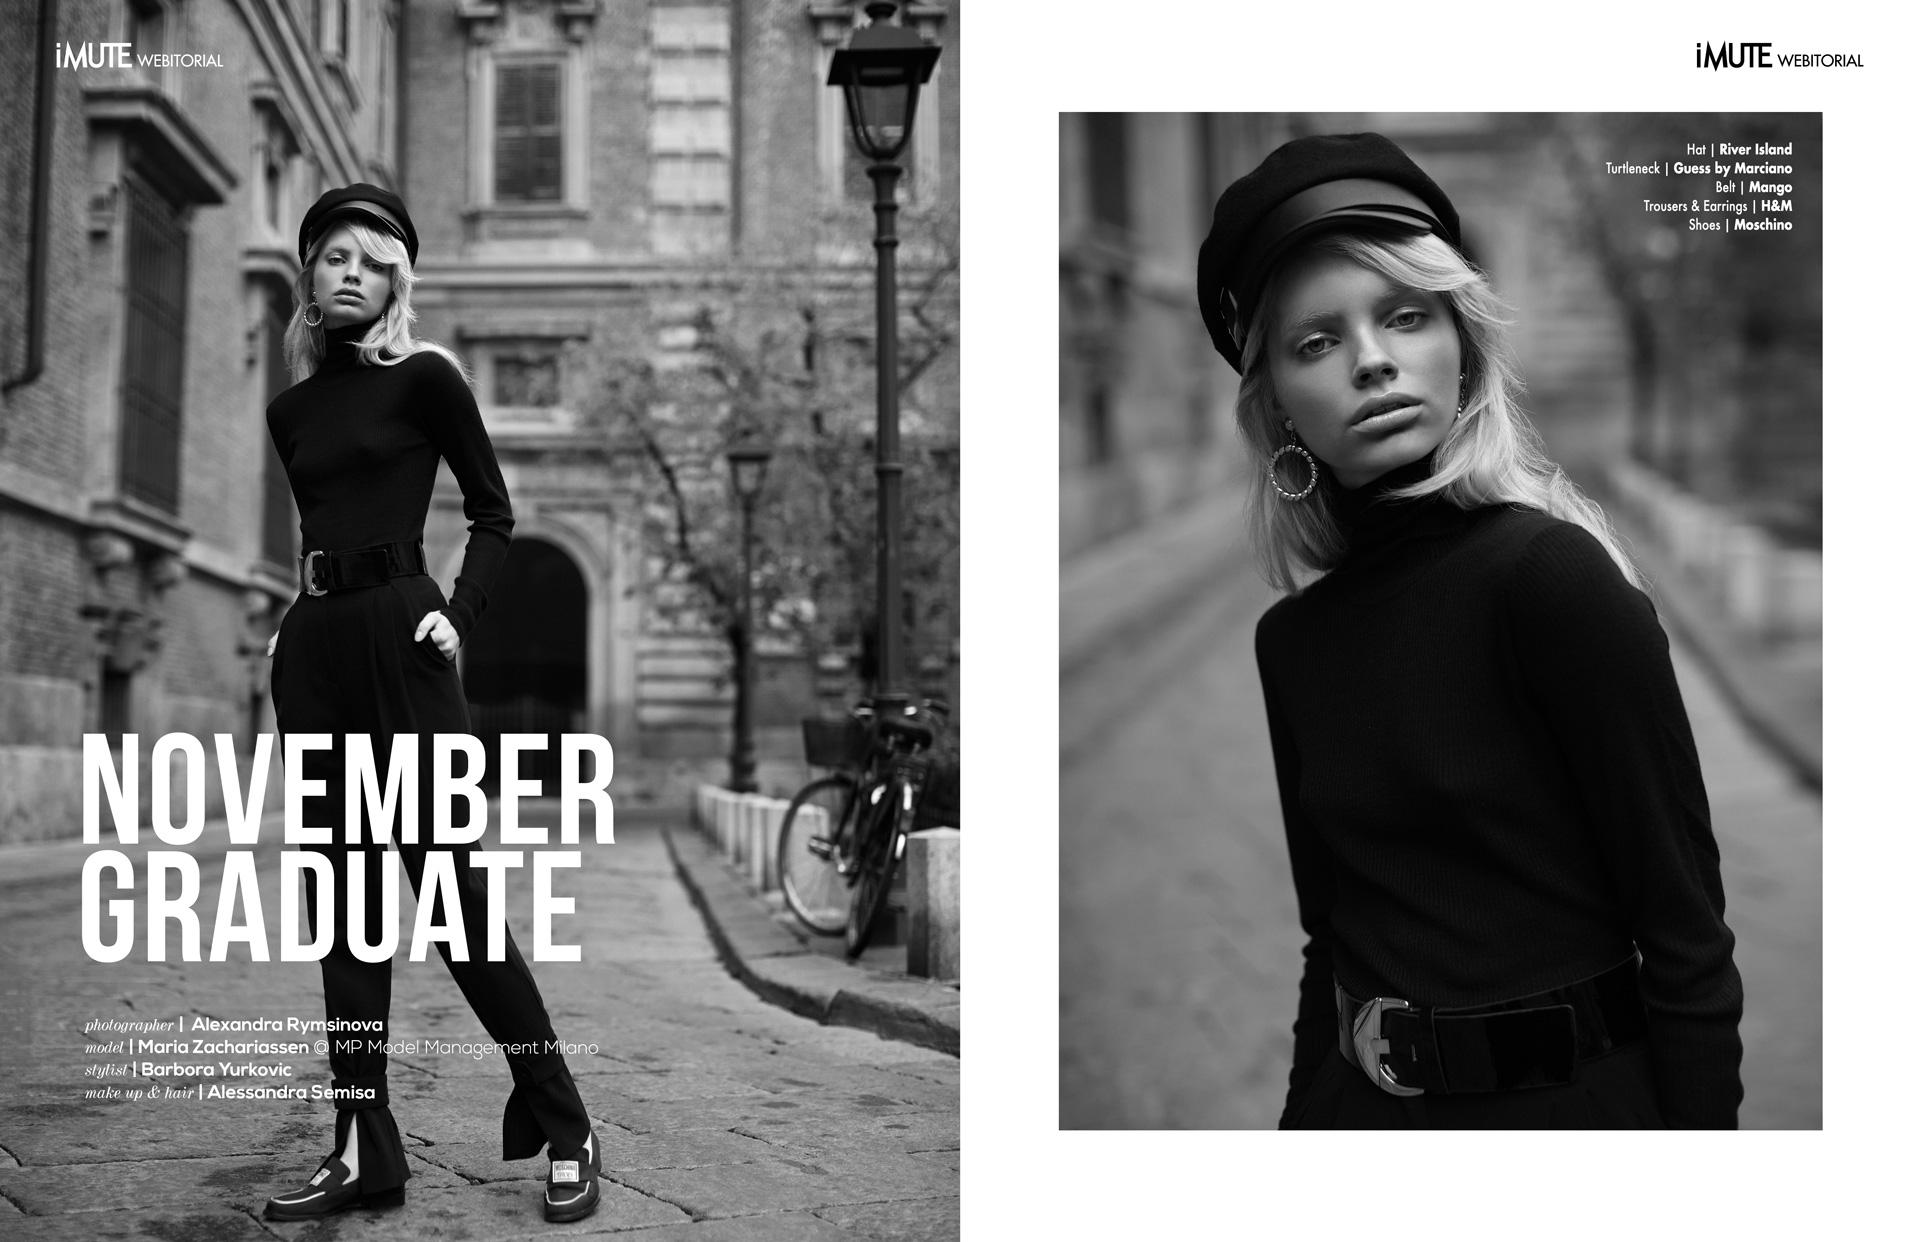 November Graduate webitorial for iMute Magazine Photographer Alexandra Rymsinova Model  Maria Zachariassen @MP Model Management Milano Stylist Barbora Yurkovic Makeup & Hair Alessandra Semisa